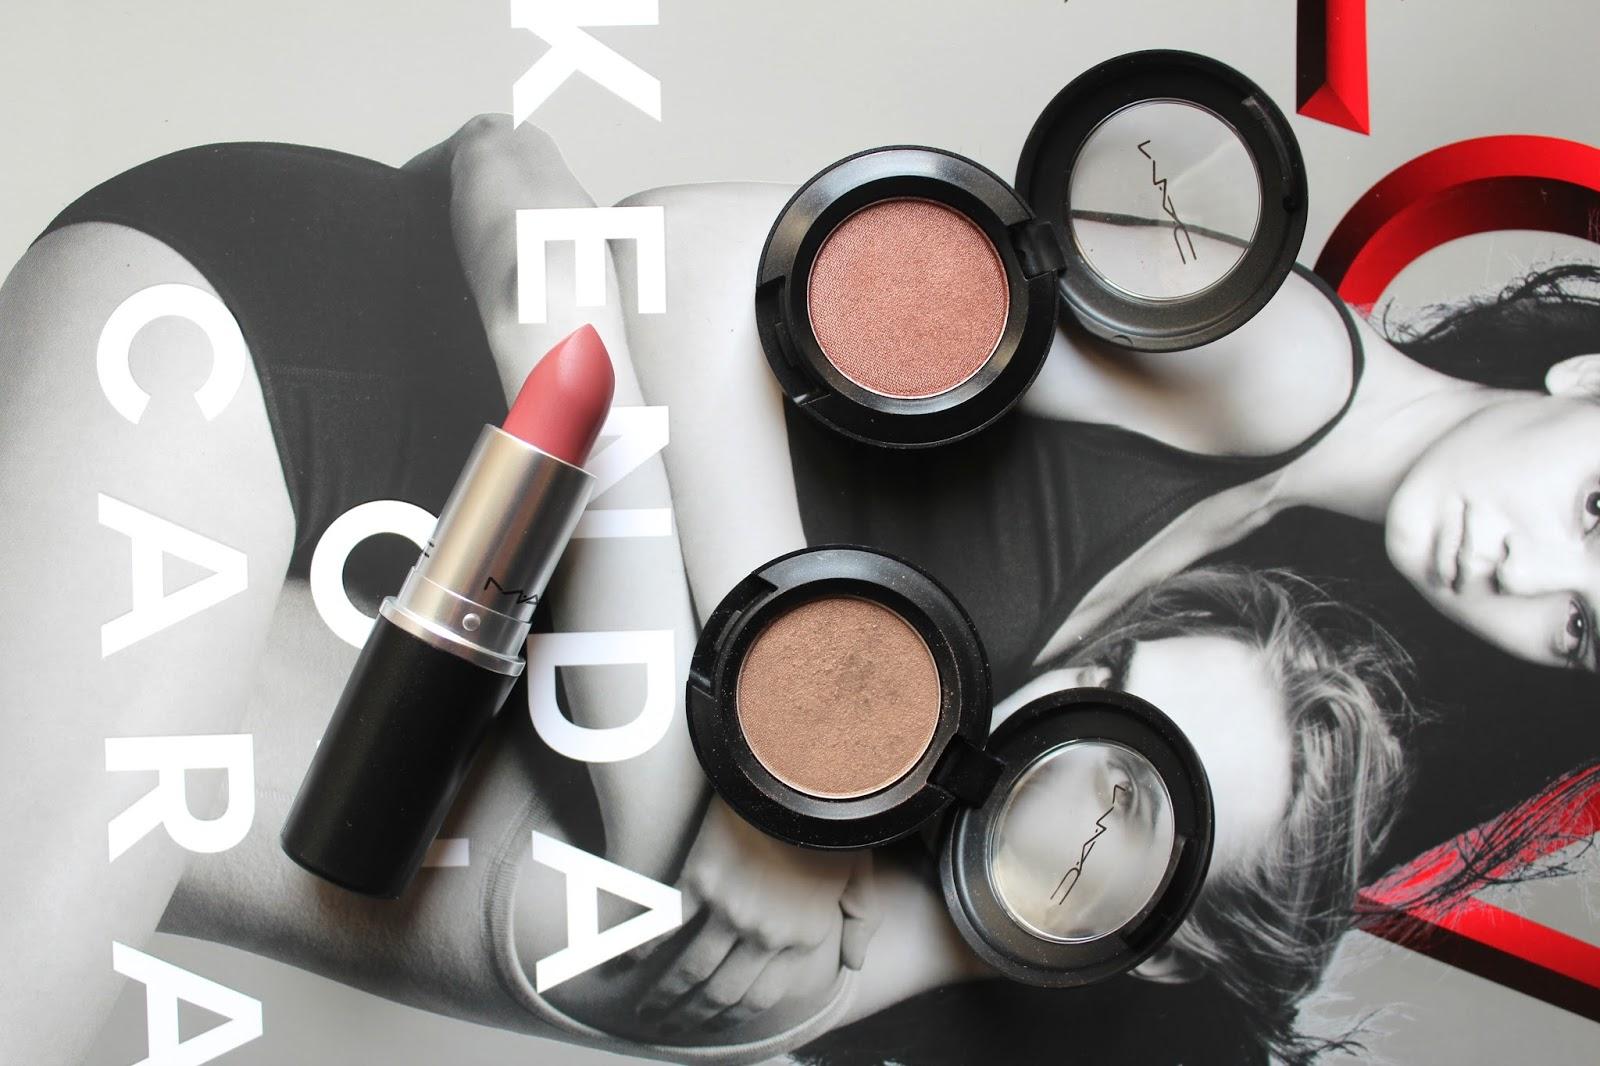 mac cosmetics haul bblogger bblogger beauty make up lipstick swatch eyeshadow instagram blog blogger patina frost sable brave satin finish